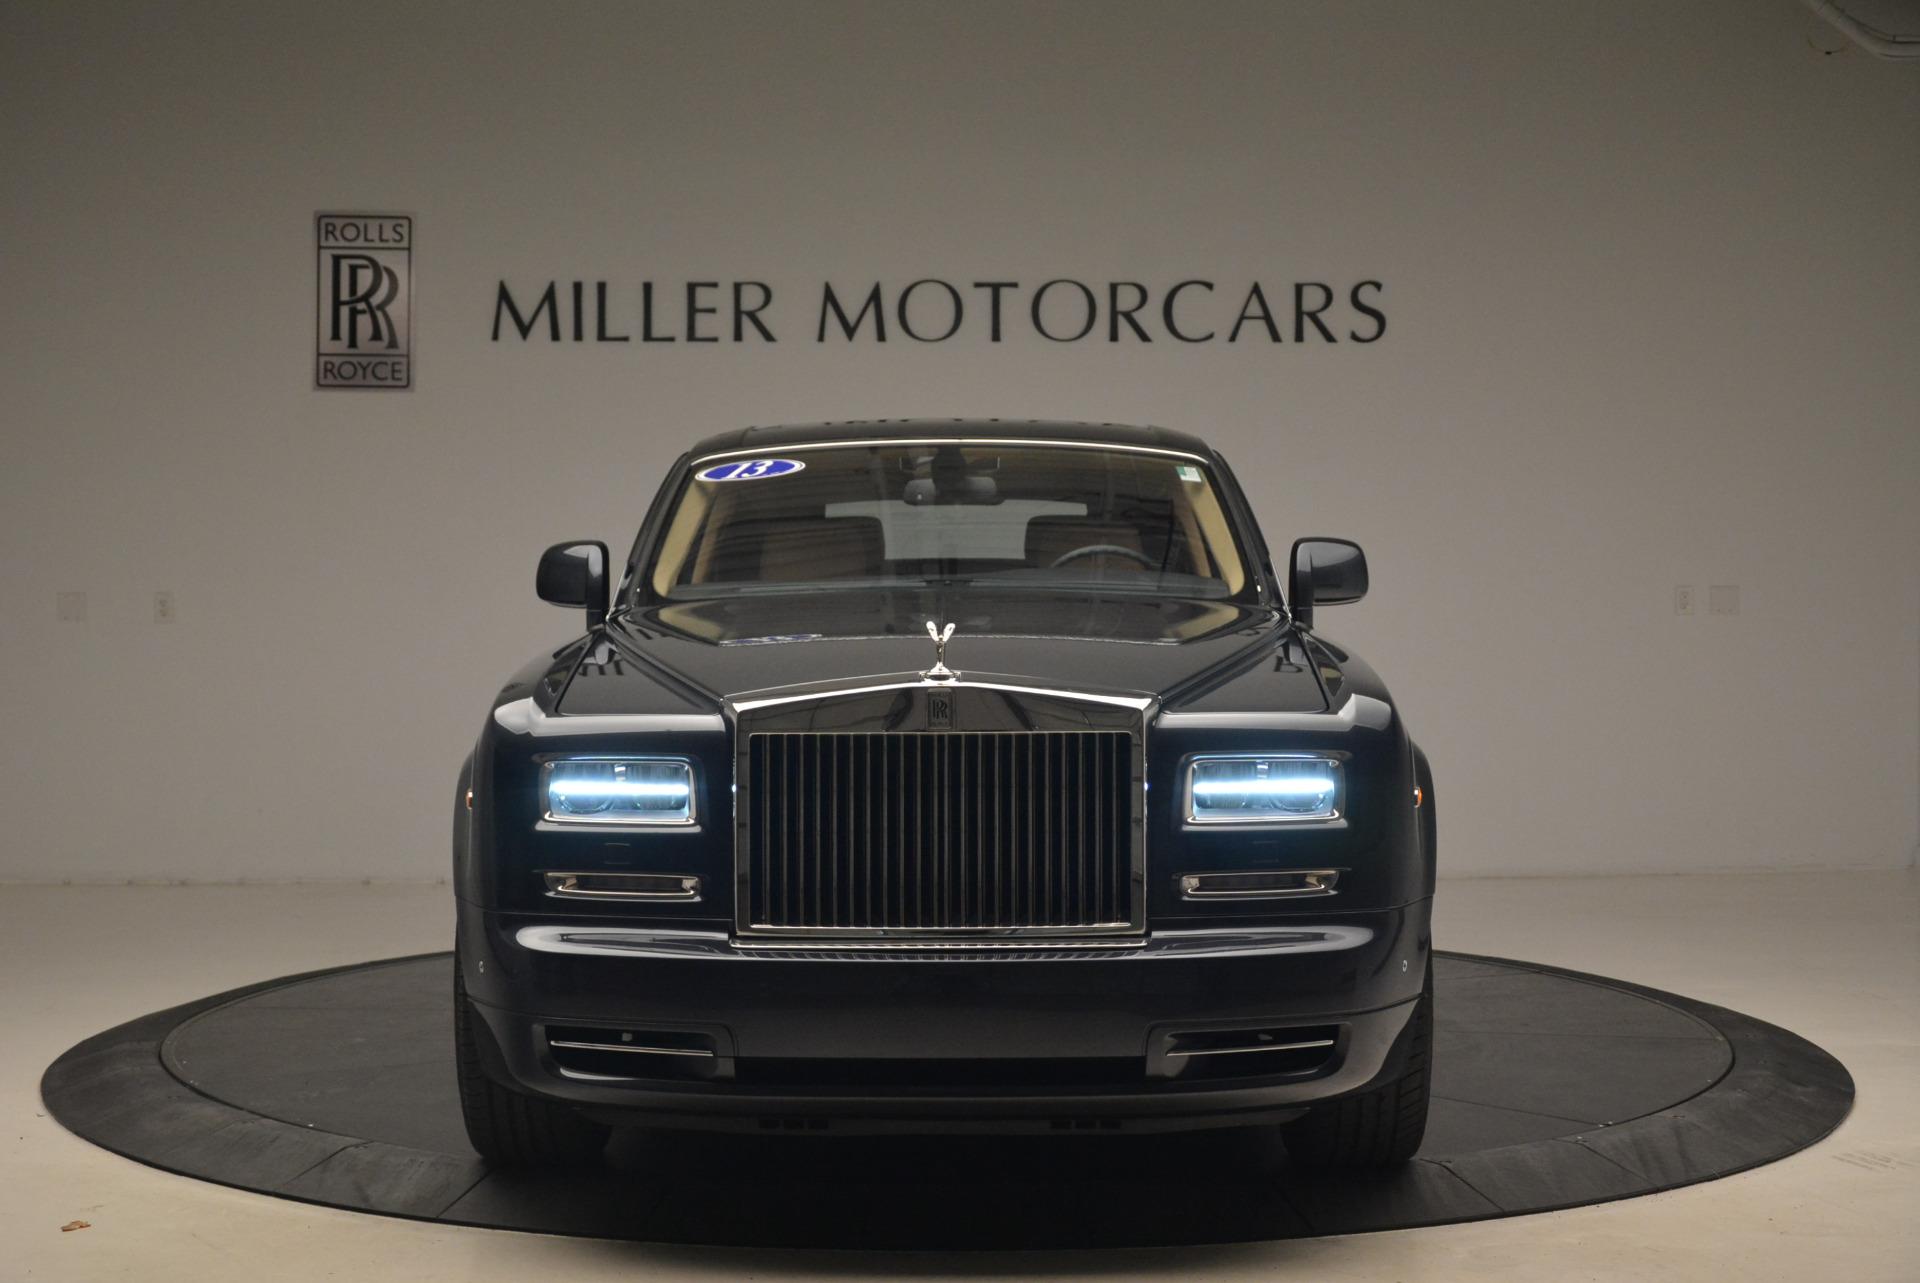 Used 2013 Rolls-Royce Phantom  For Sale In Greenwich, CT 2208_p3